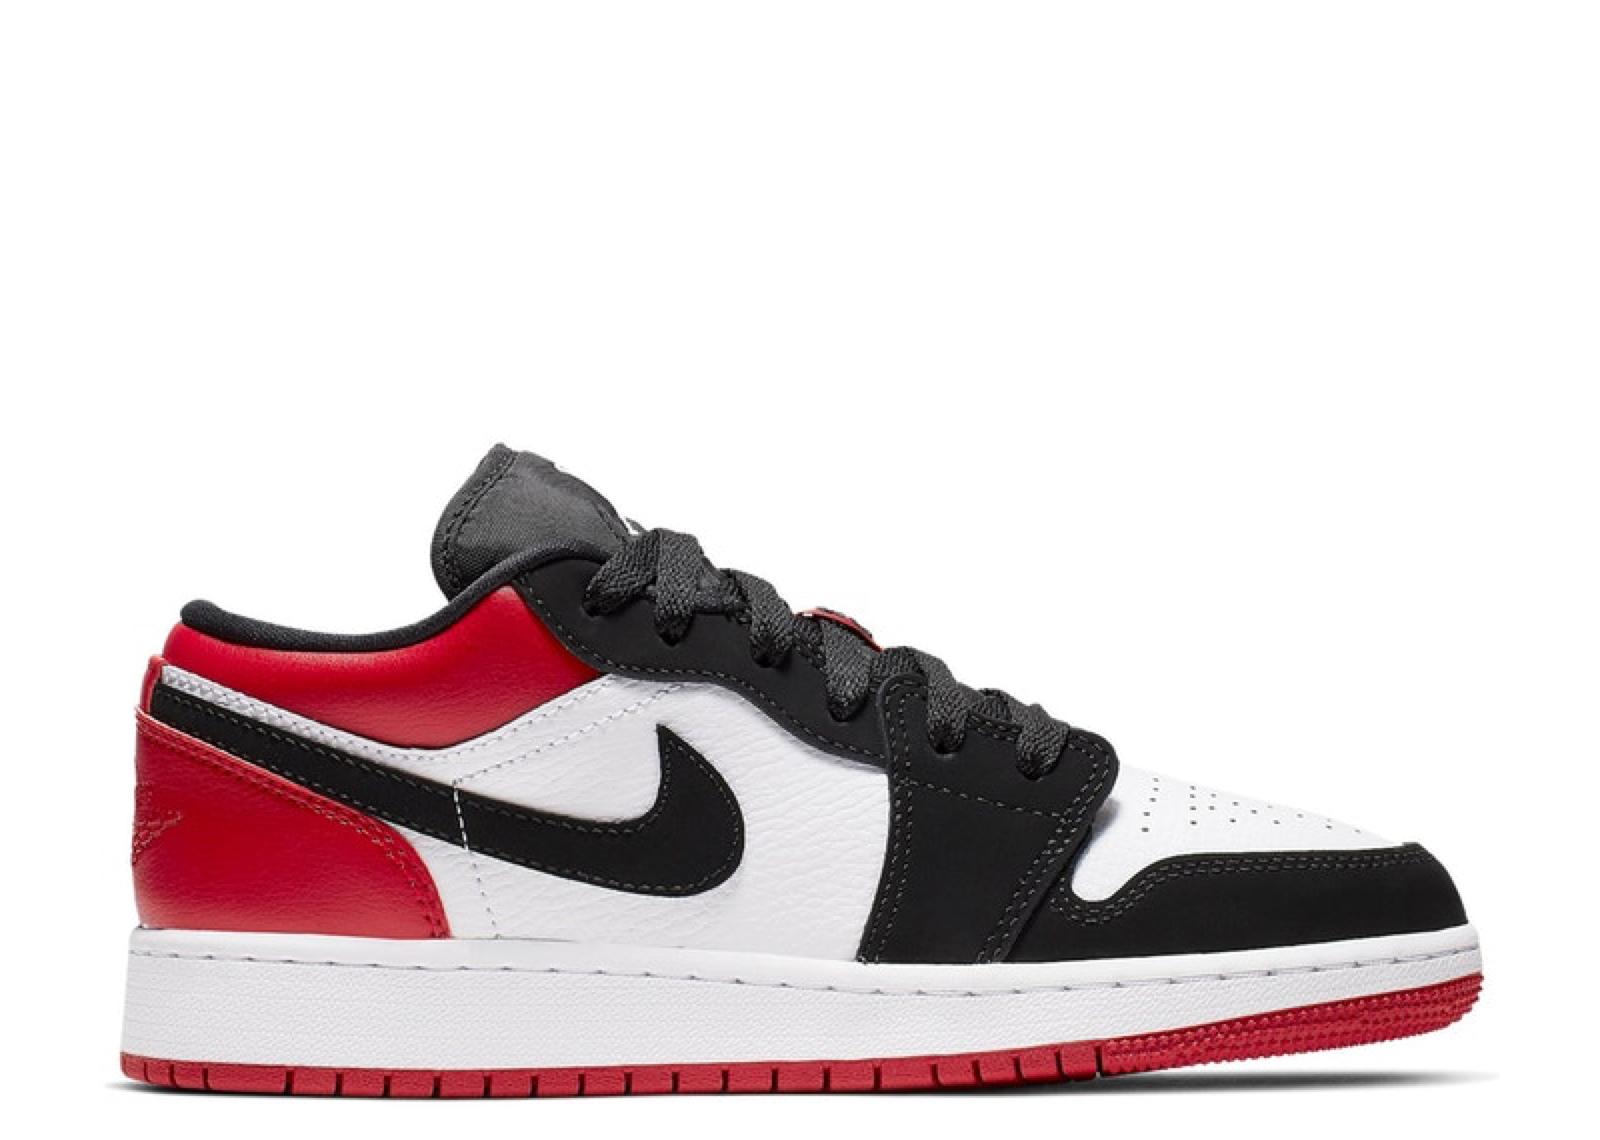 3c941efb6 Kick Avenue - Authentic Sneakers